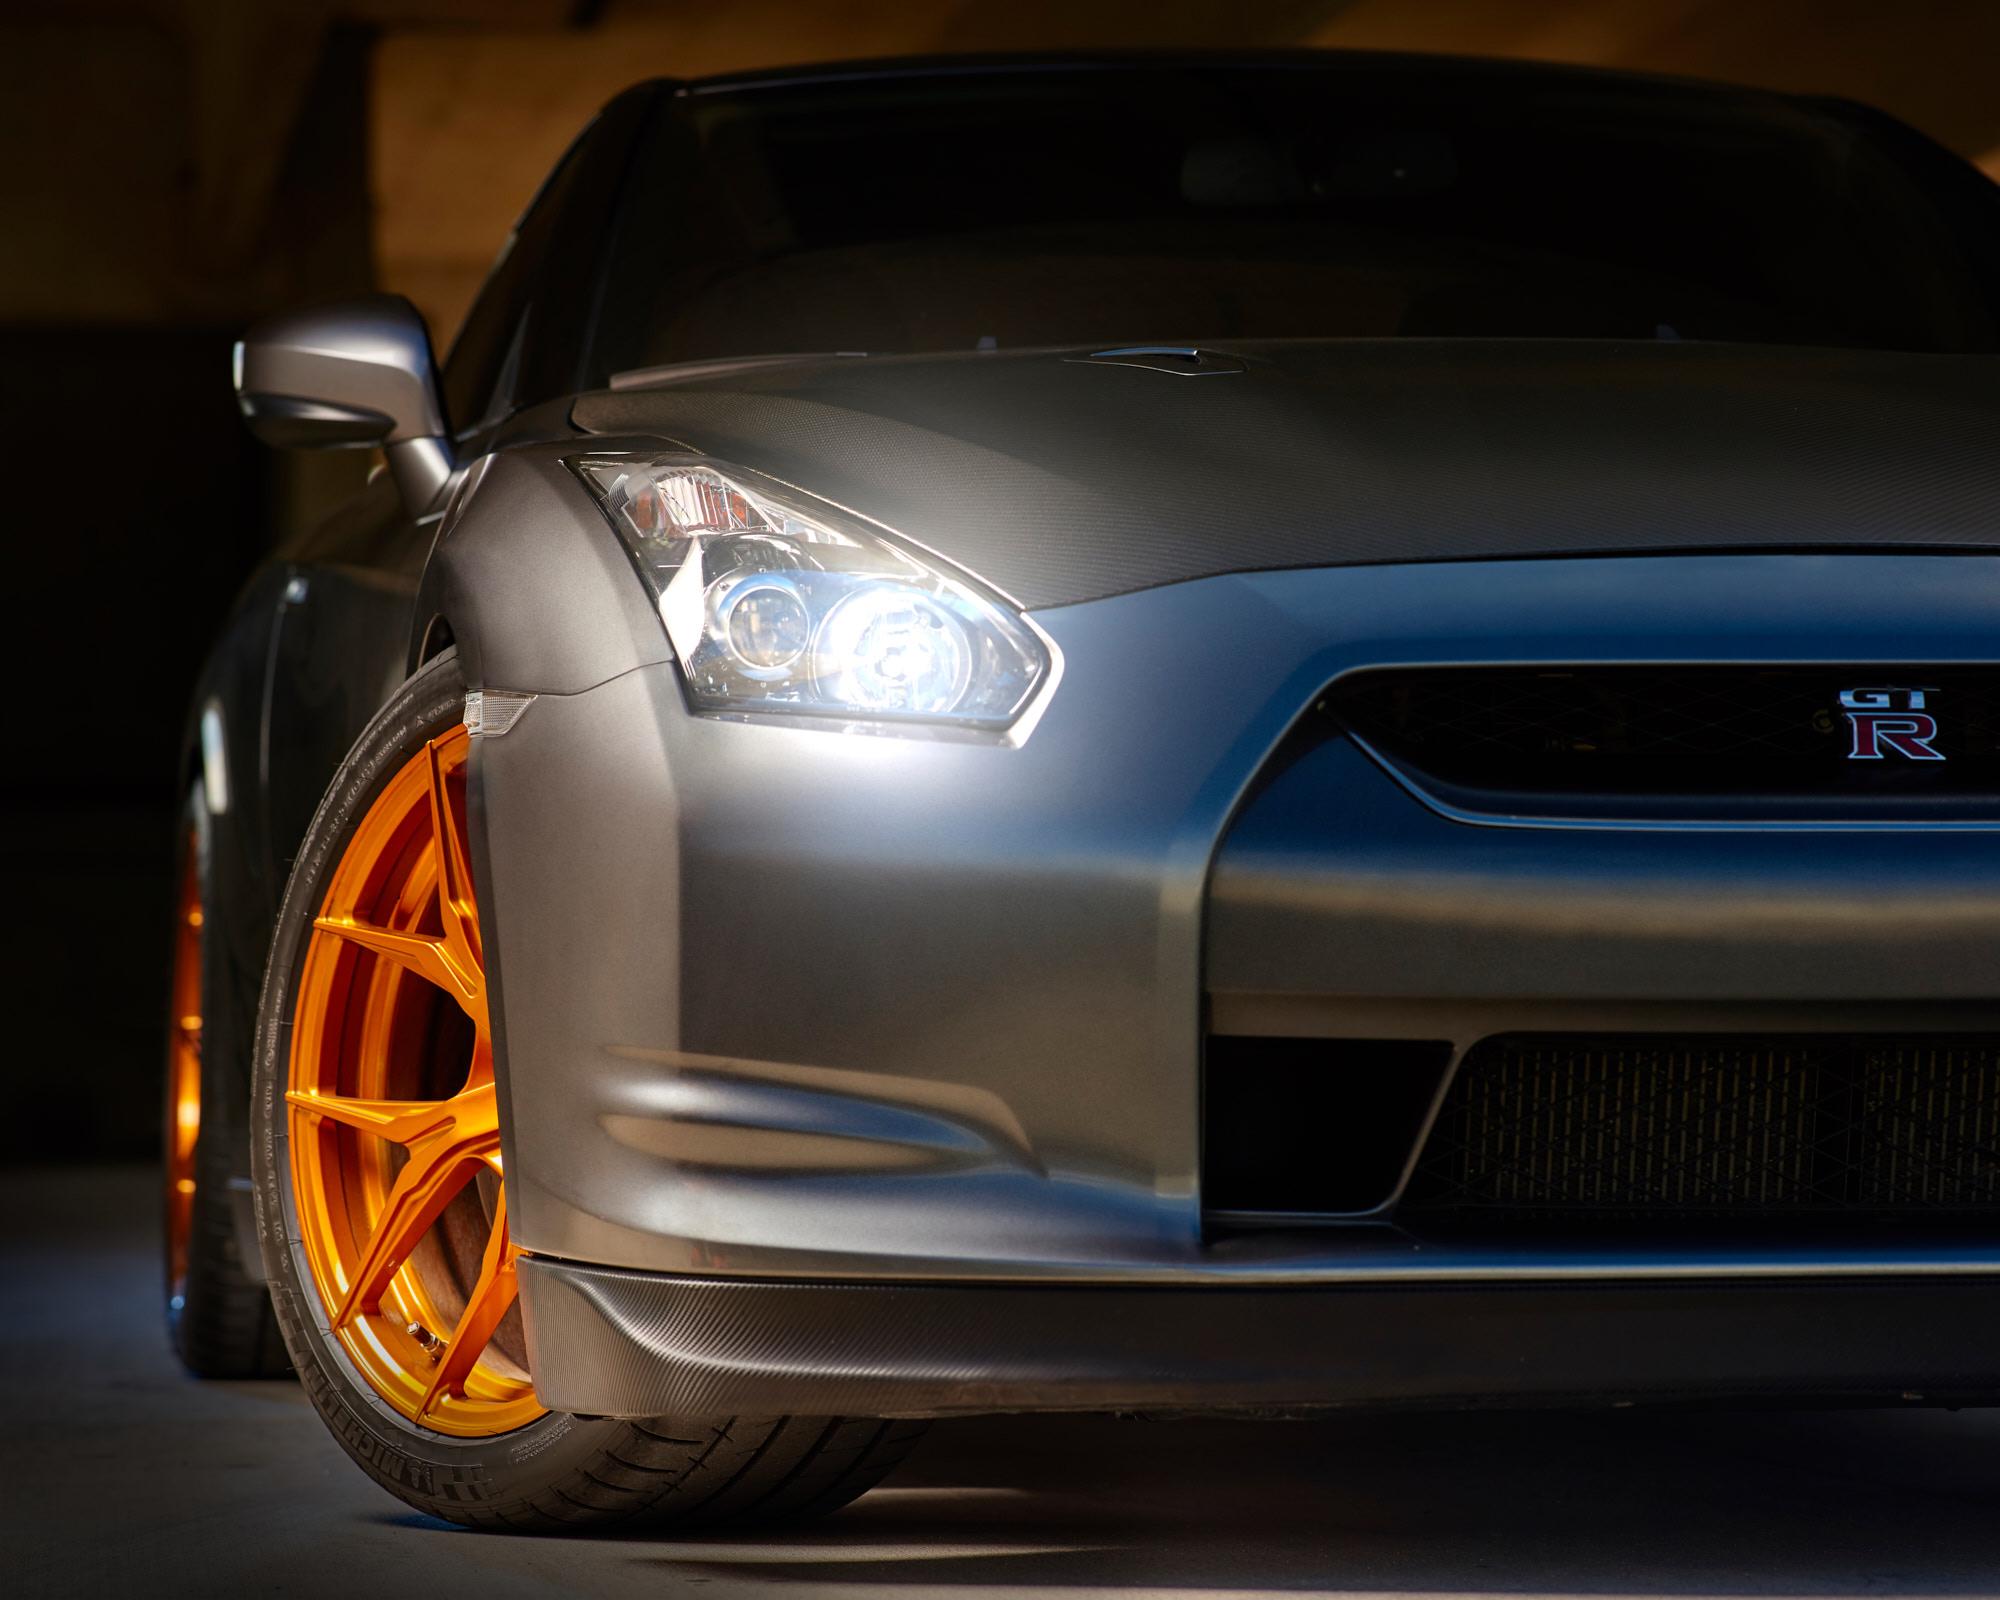 Automotive Photographer Austin Car And Automotive Photography Azulox Texas